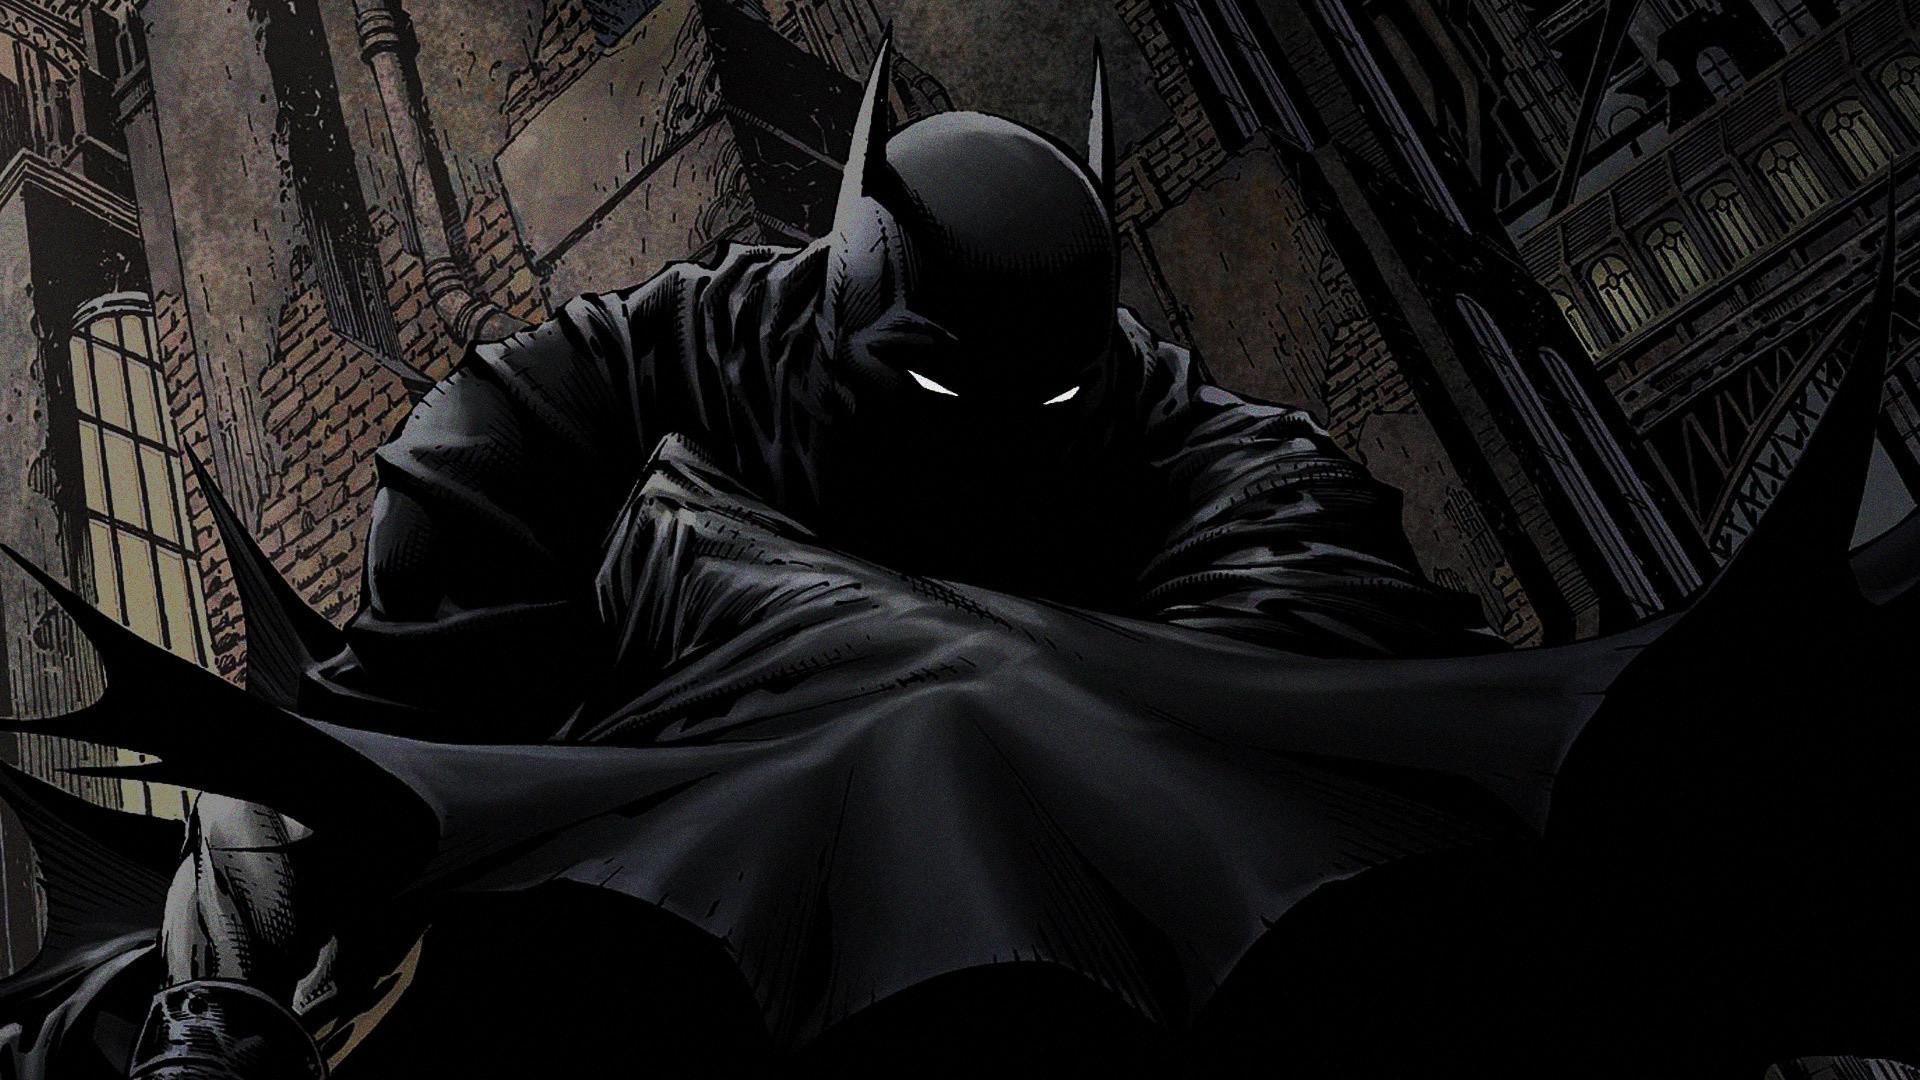 batman dark hd wallpapers free download movies wallpapers